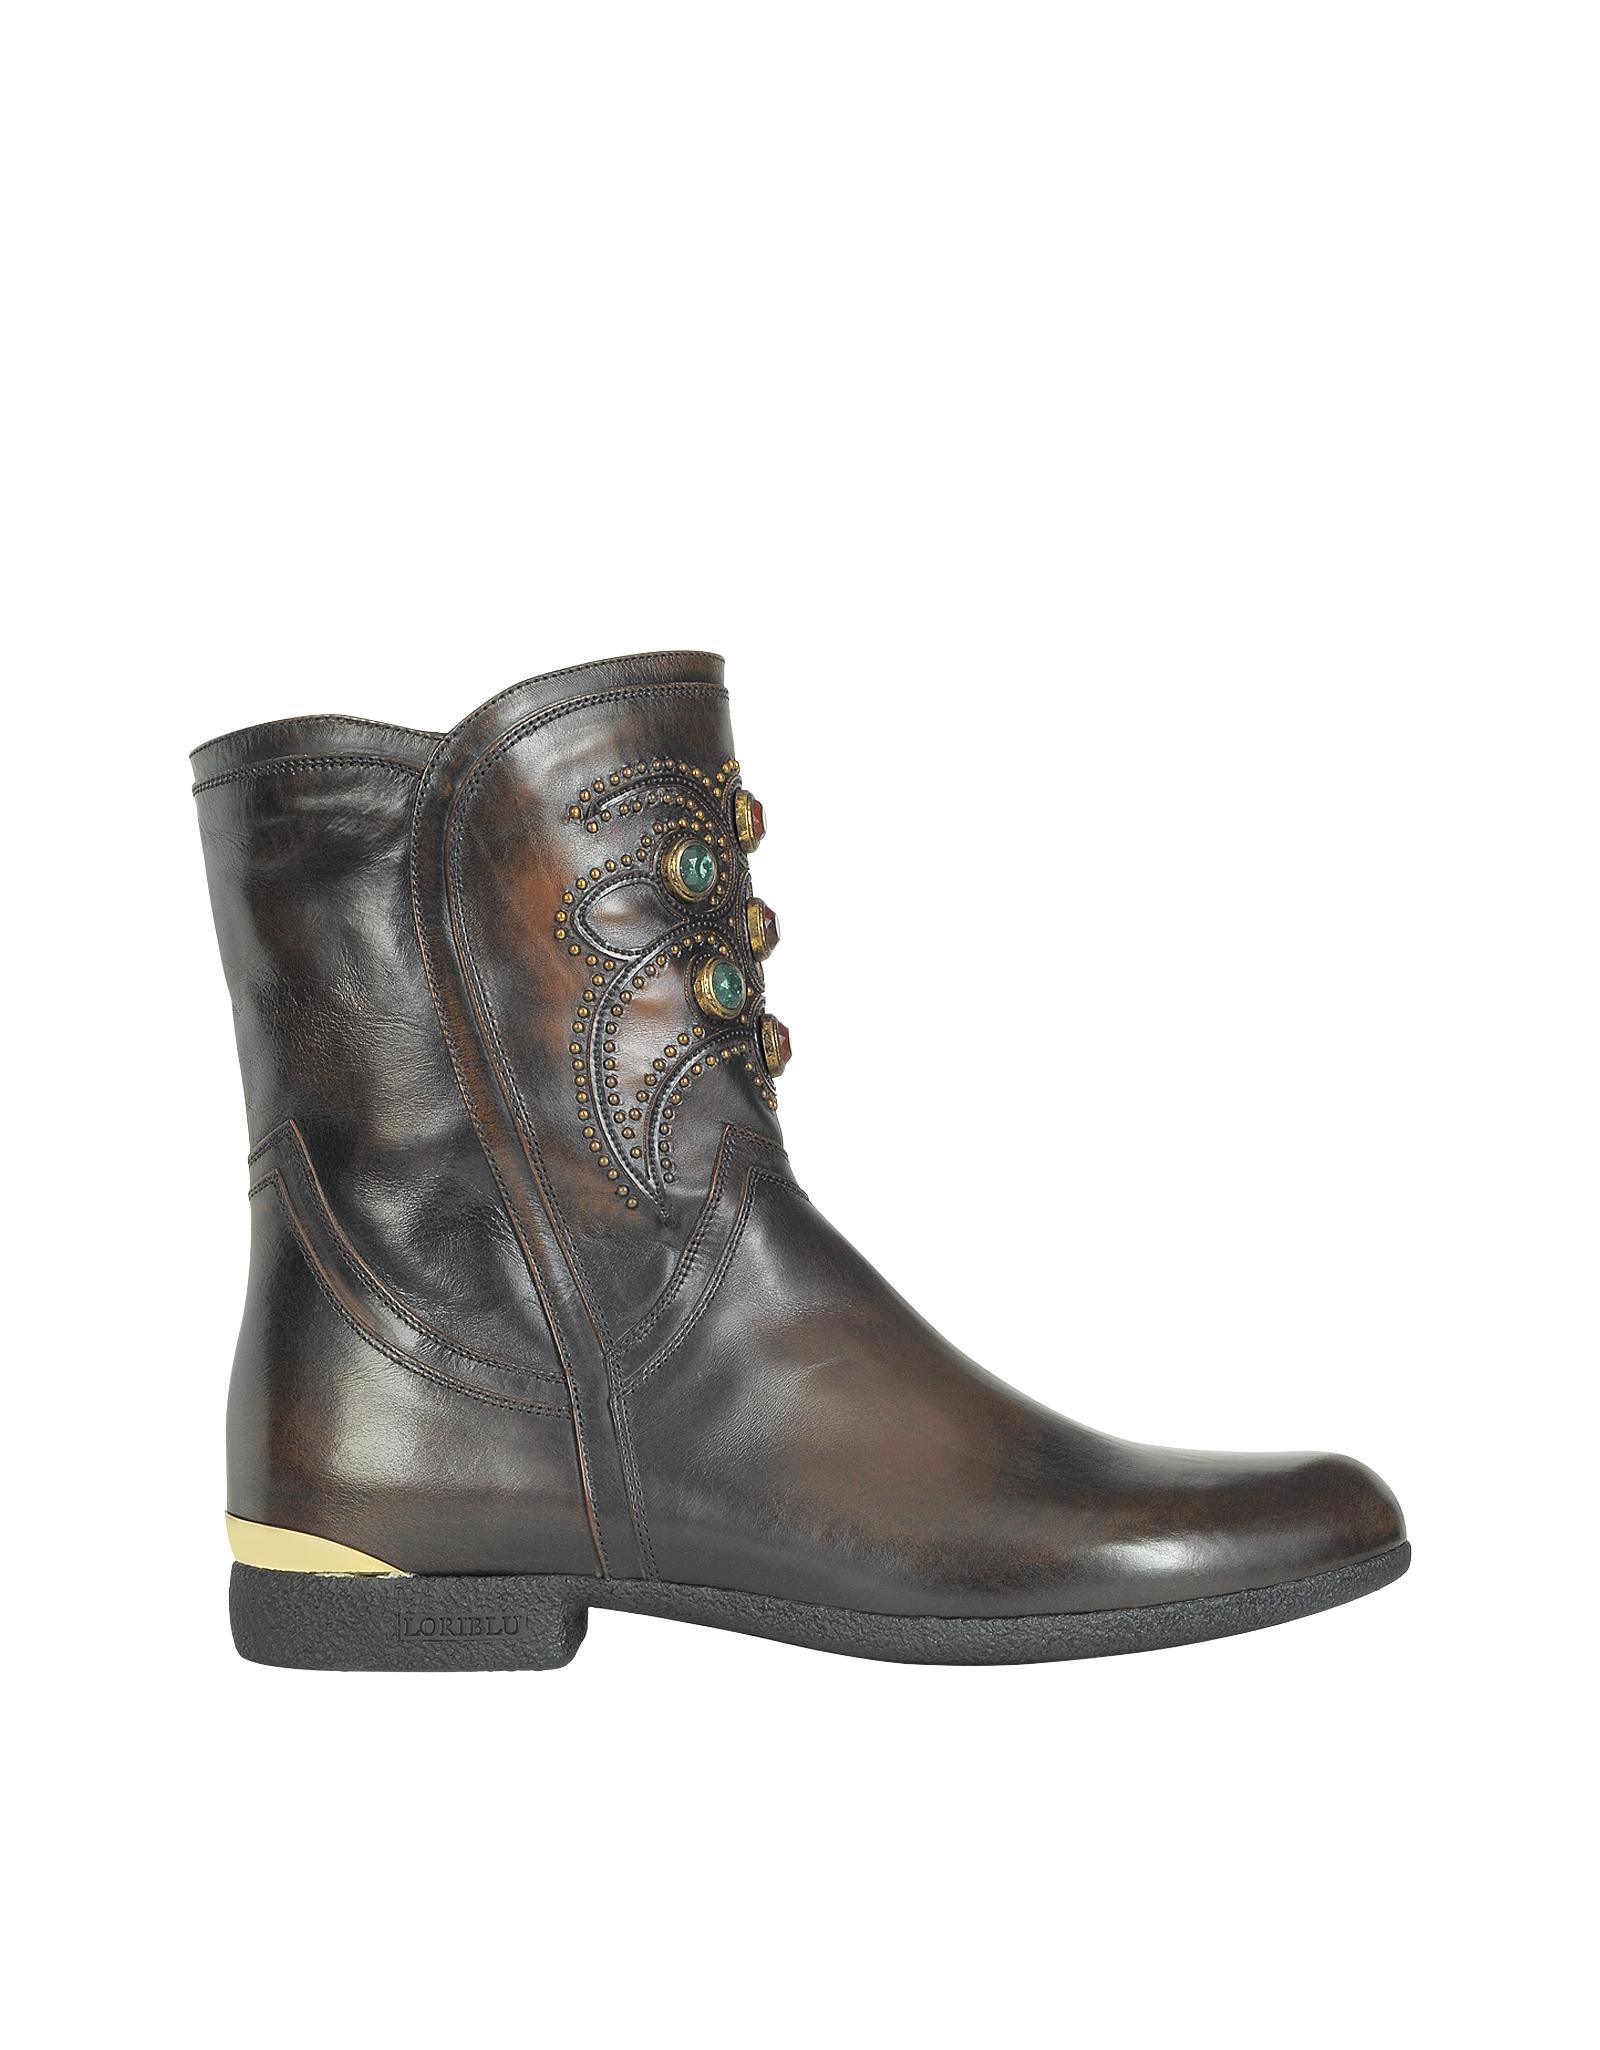 Loriblu Shoes Uk